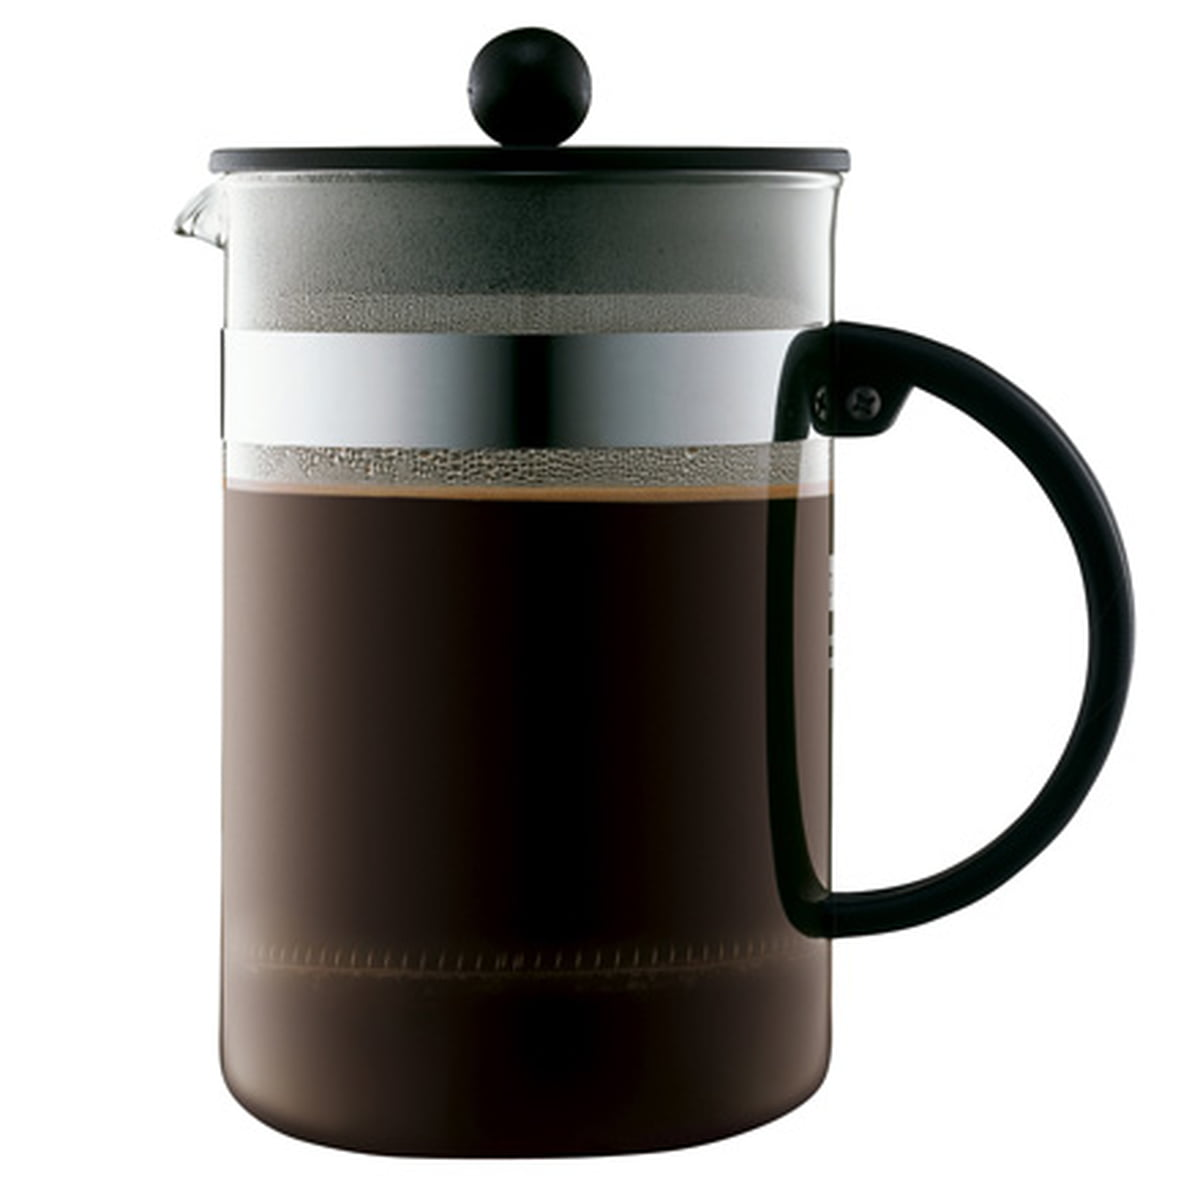 Glass Coffee Makers bistro nouveau coffee maker | bodum | shop